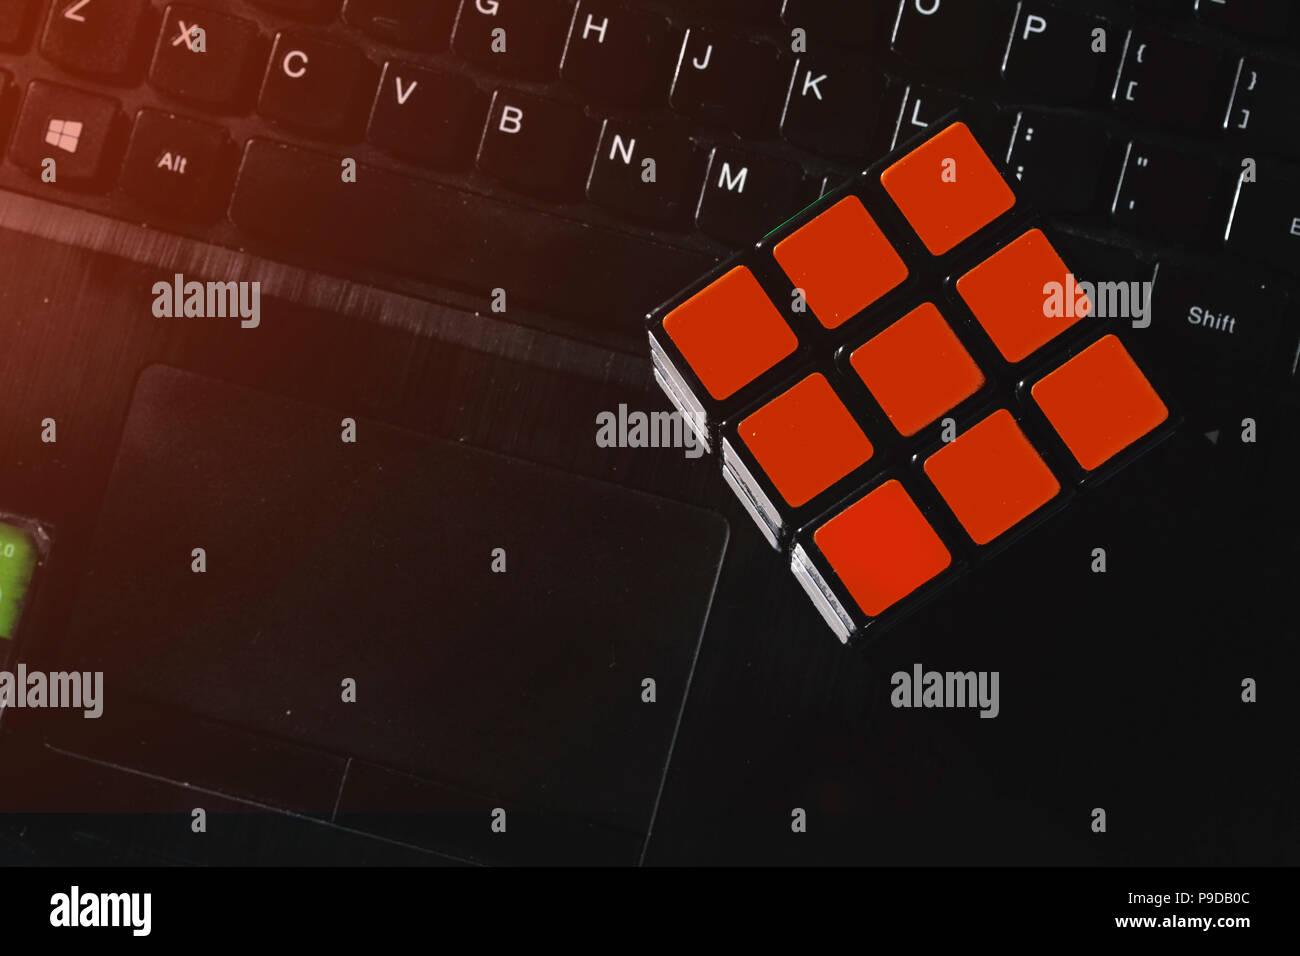 Problem Solving Cube Near Laptop Keyboard Stock Photo 212350332 Alamy